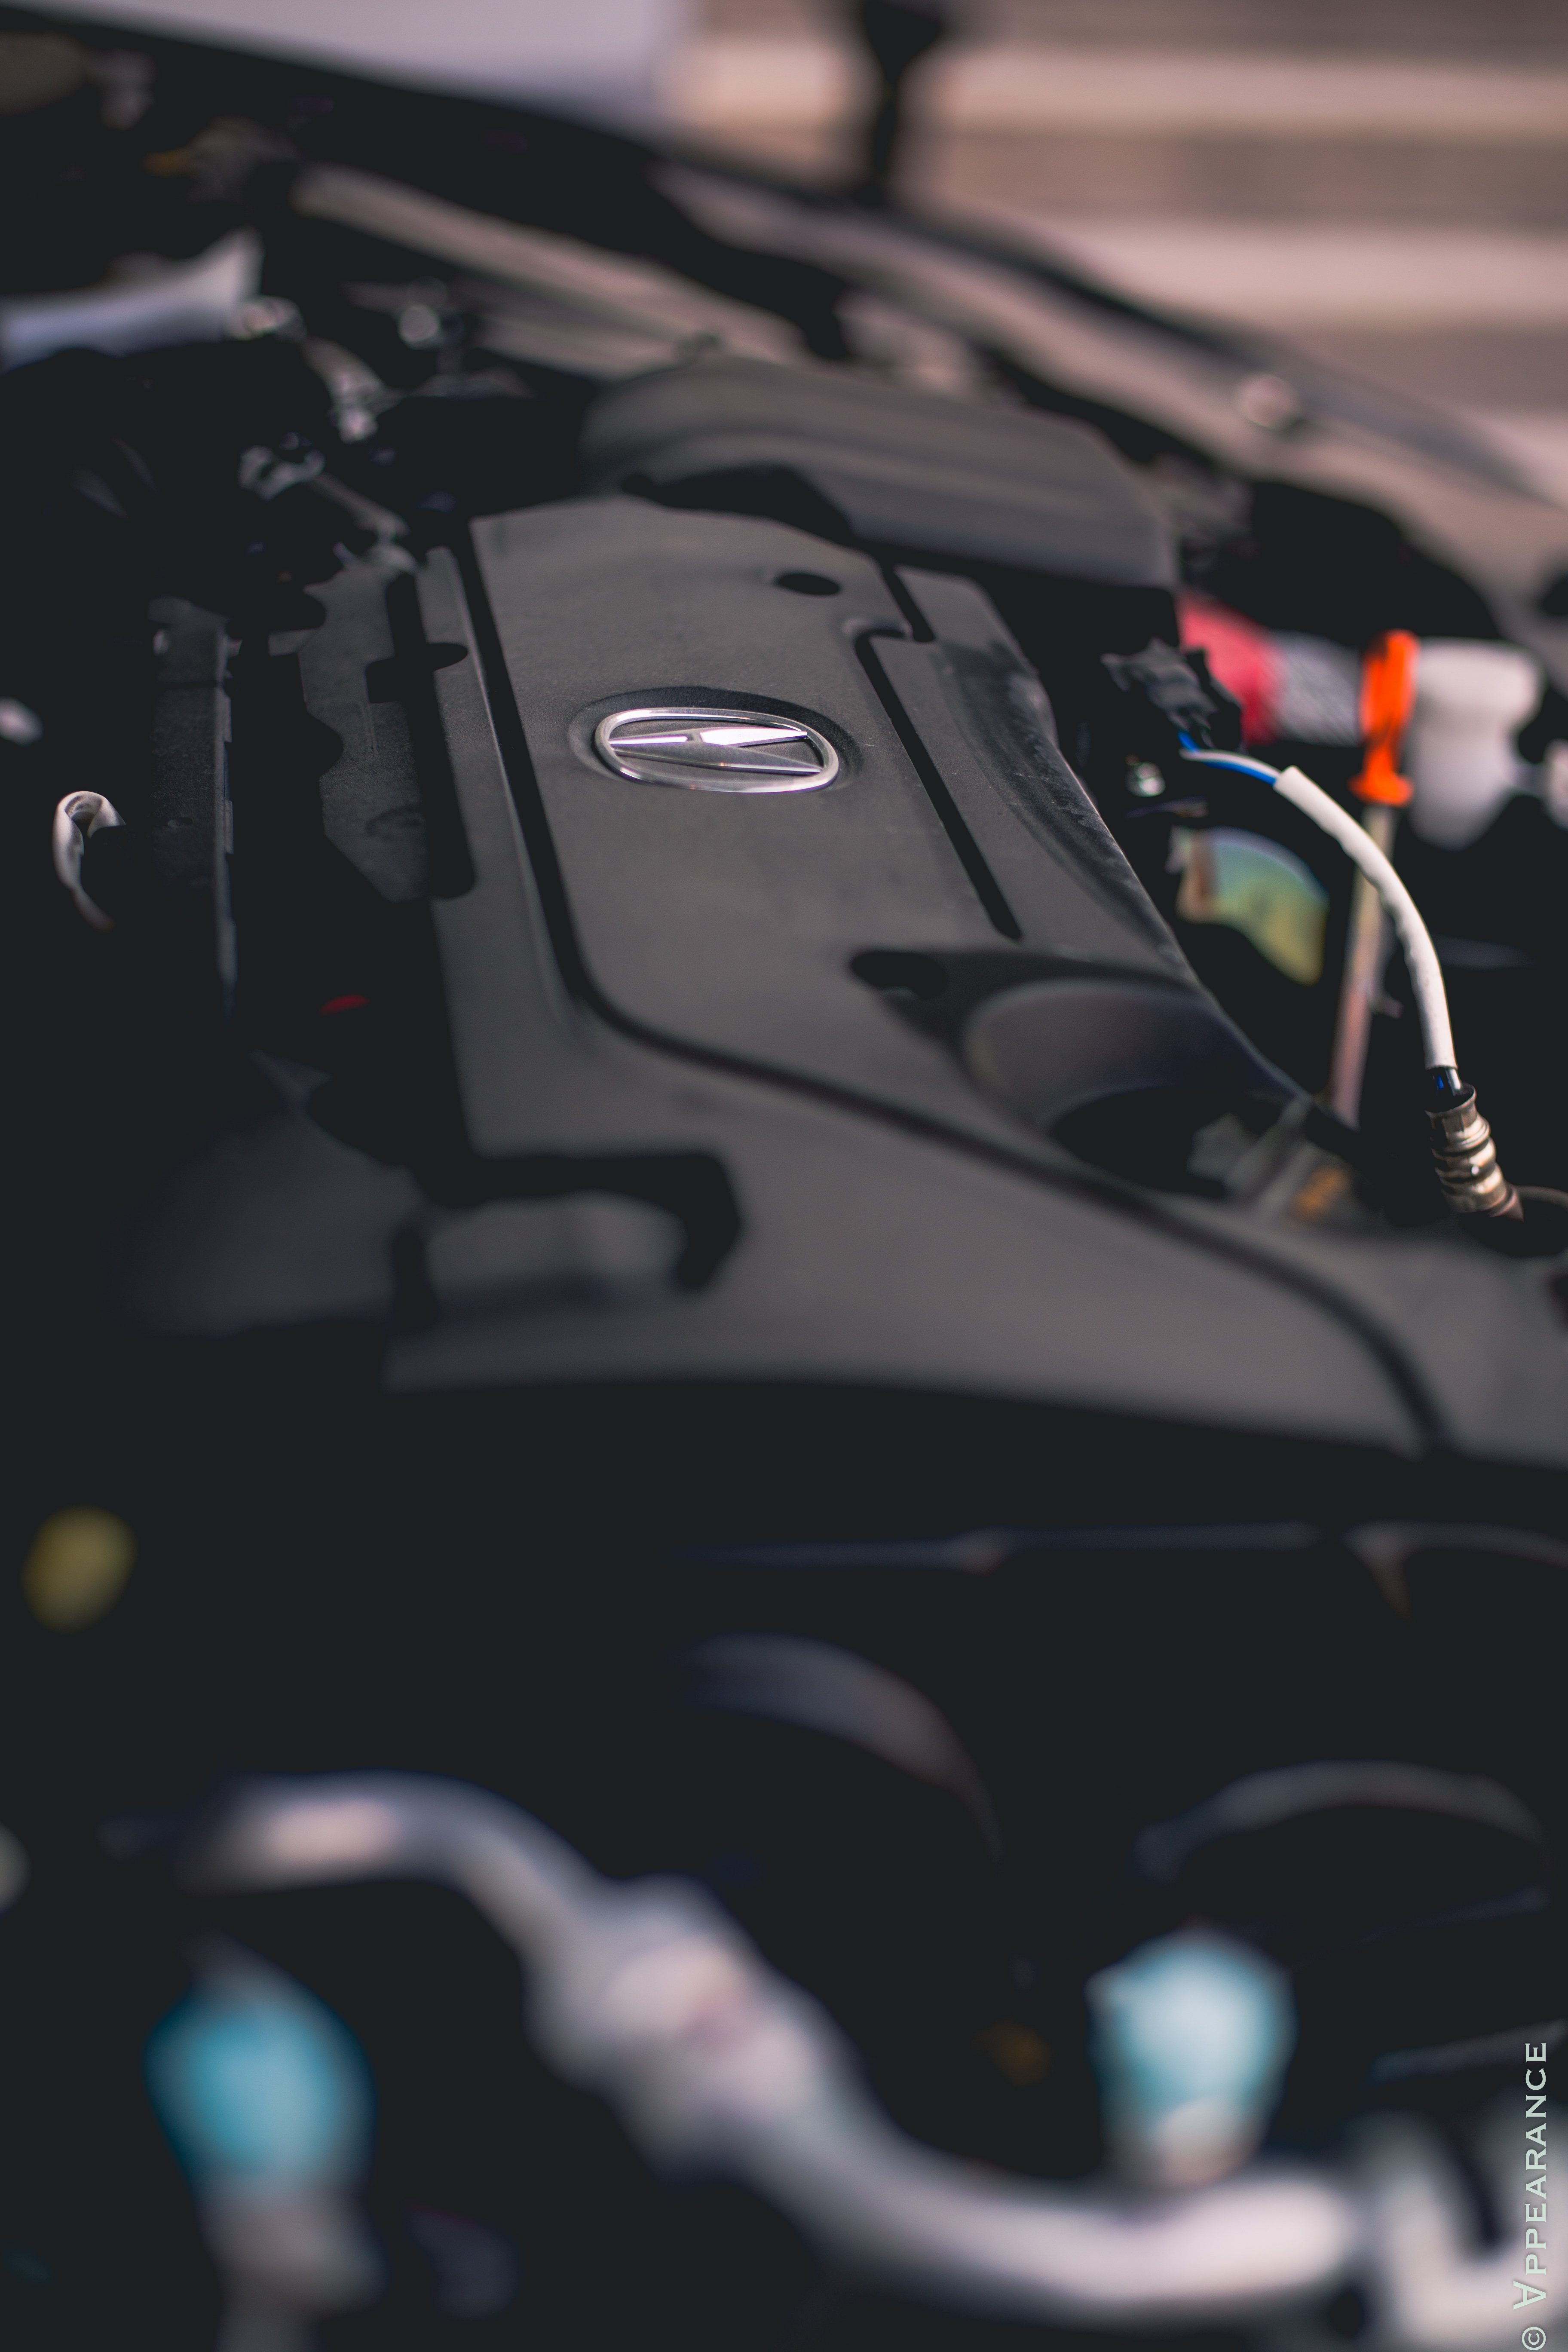 2017 Acura ILX Comprehensive Review   Clavey's Corner